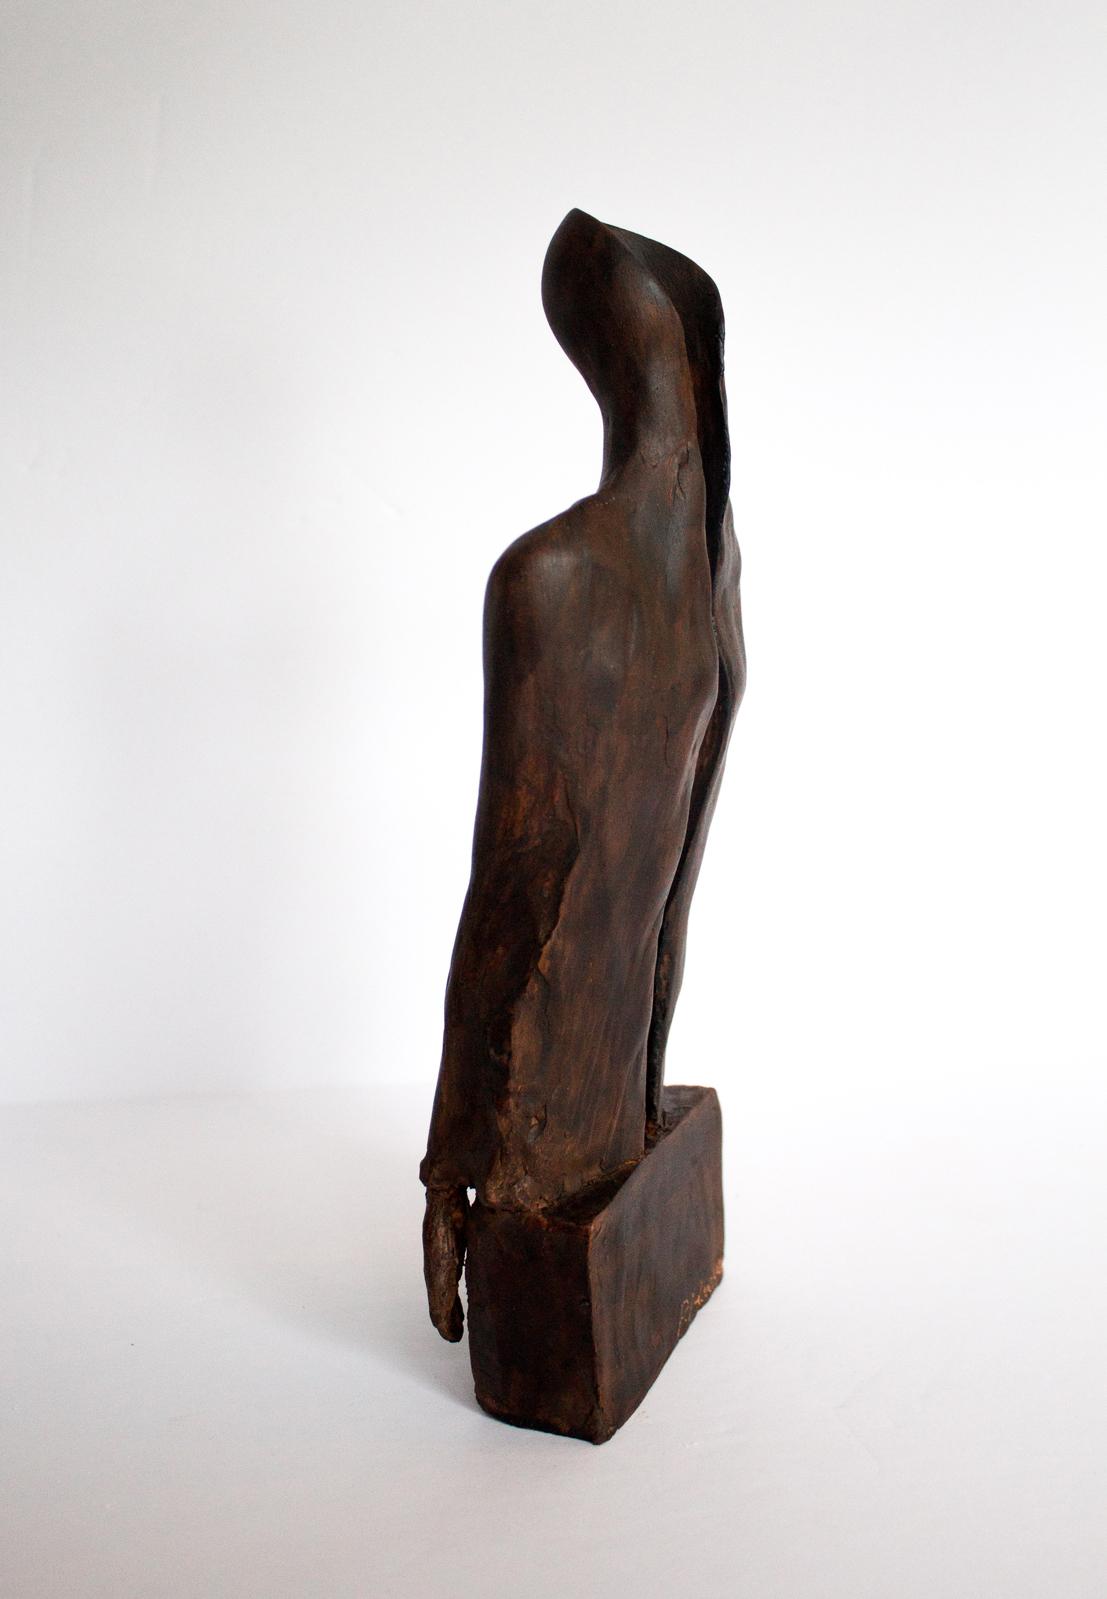 Woman Figure 12.27.8 cm painted terracotta